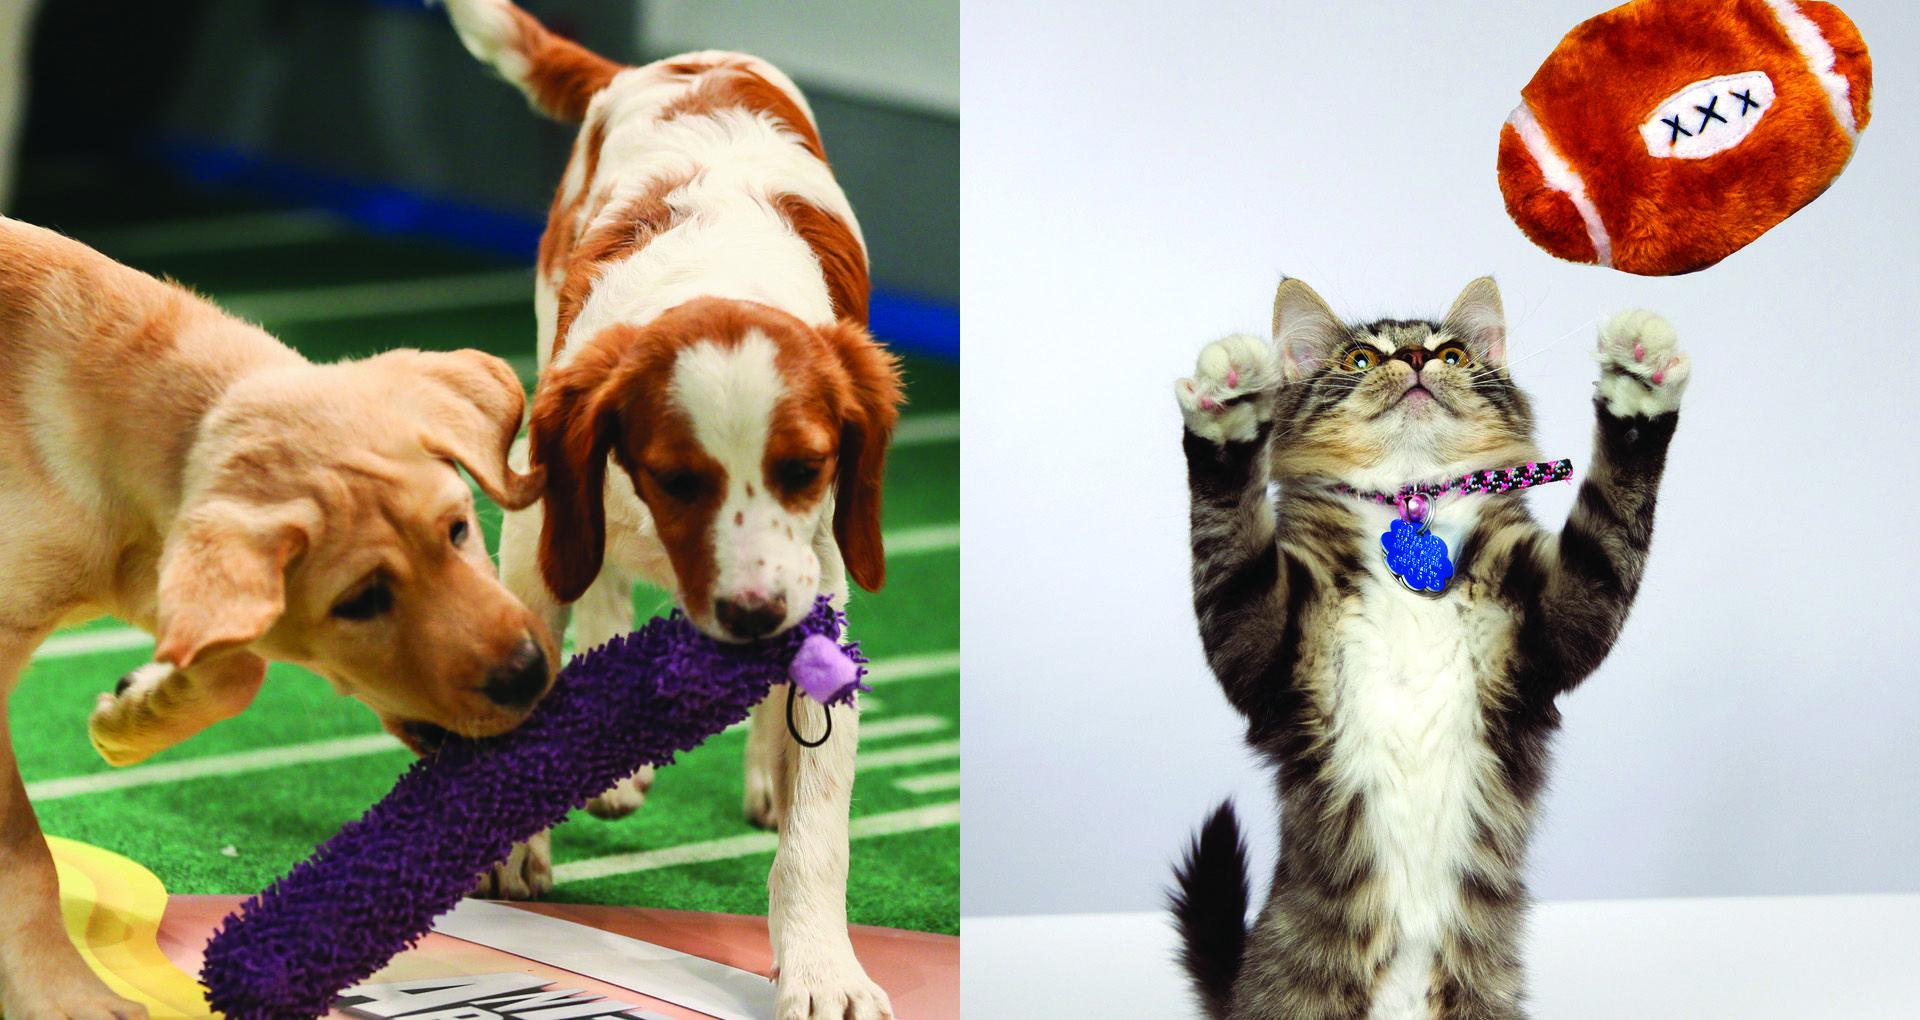 Battle Of The Real Super Bowls Puppy Vs Kitten Kitten Puppies Kitten Bowls